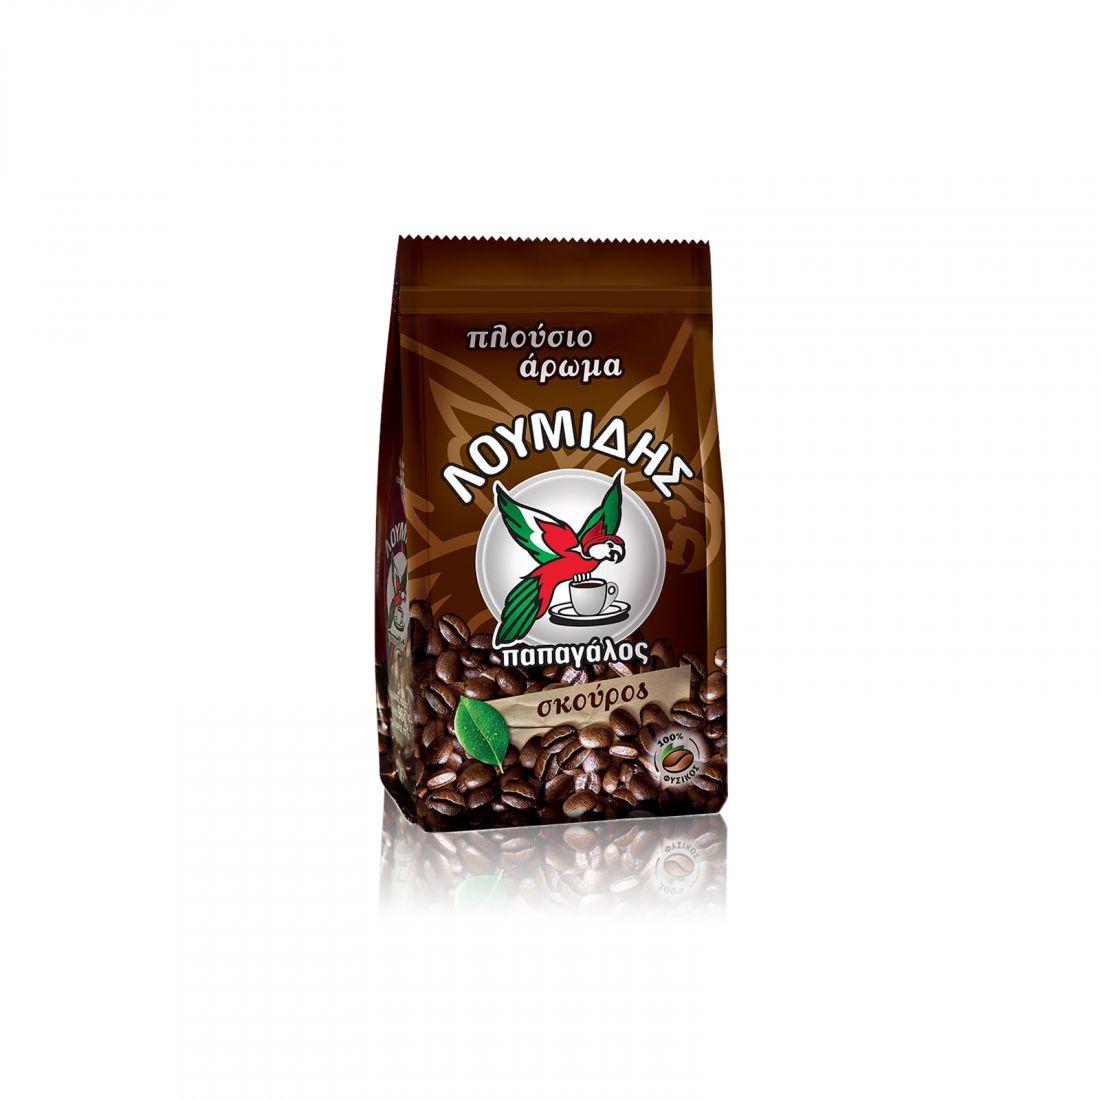 Кофе натуральный молотый Loumidis Papagalos темной обжарки - 96 гр